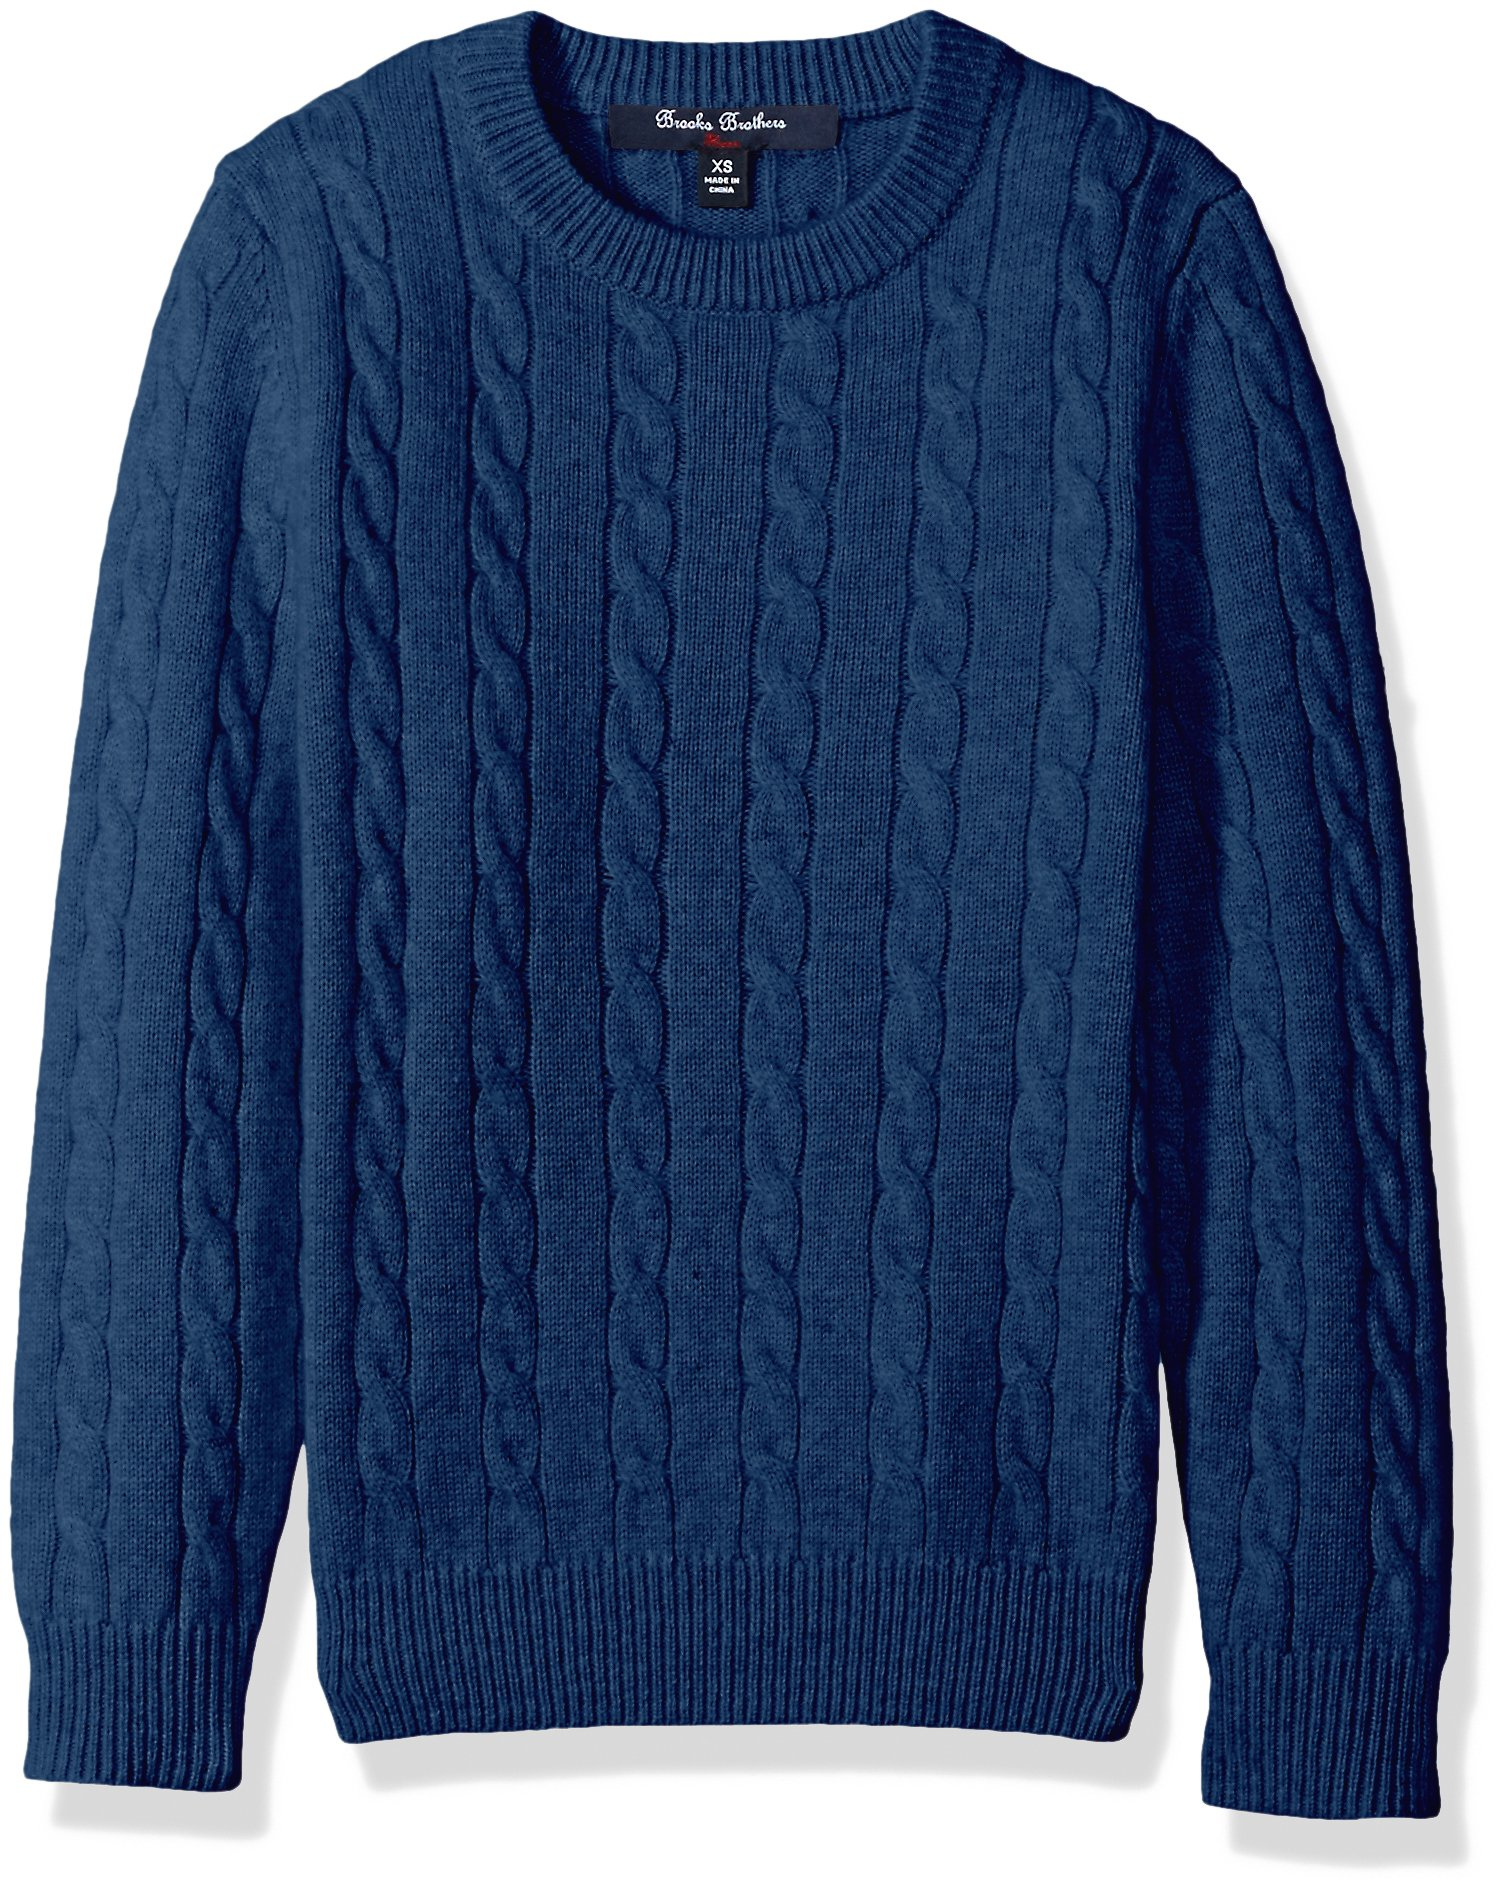 Brooks Brothers Big Boys' Cashmere Crewneck Sweater, Dark Blue, Medium by Brooks Brothers